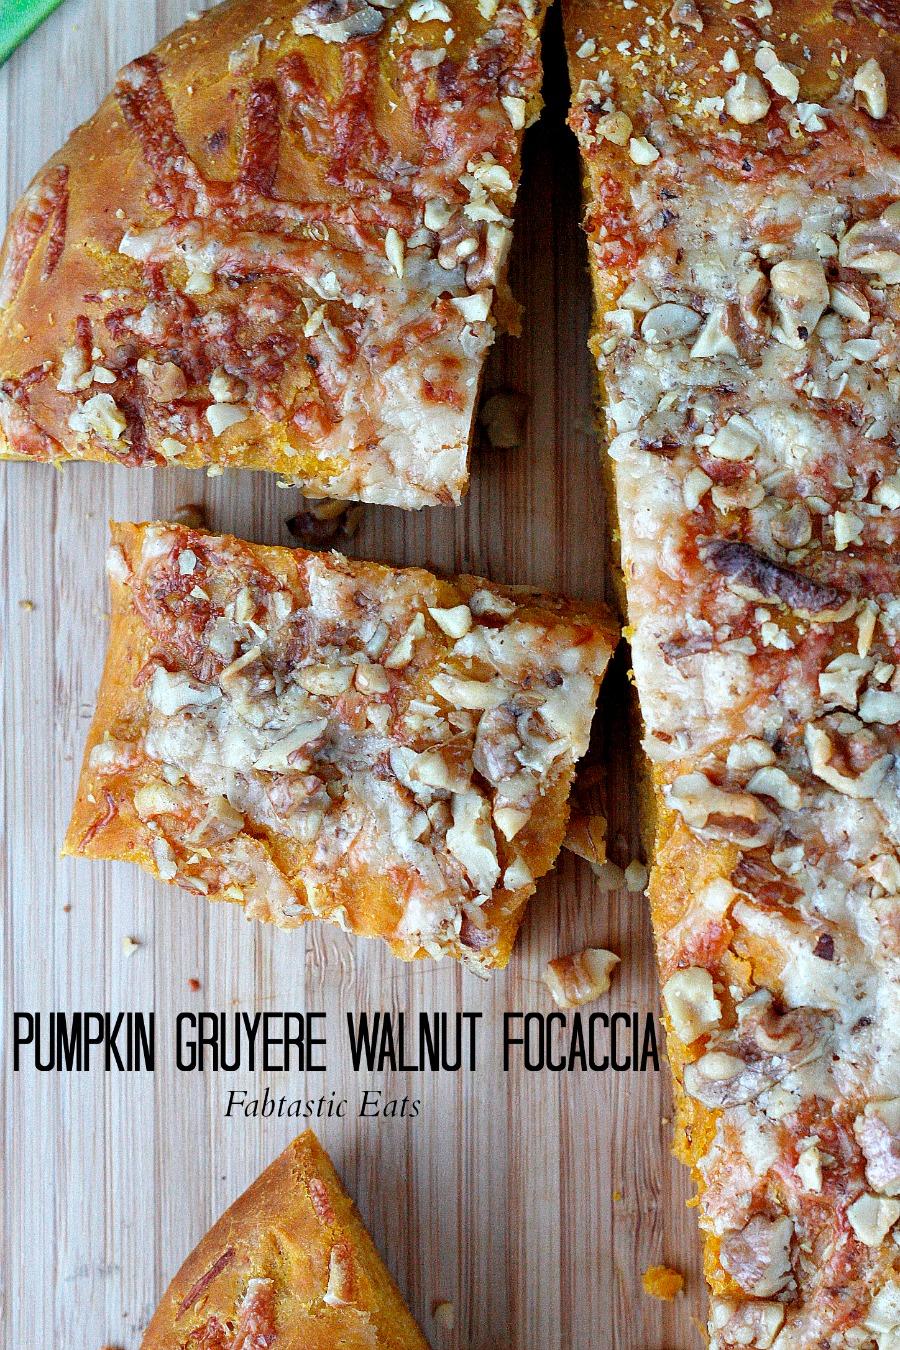 Pumpkin Gruyere Walnut Focaccia | Fabtastic Eats